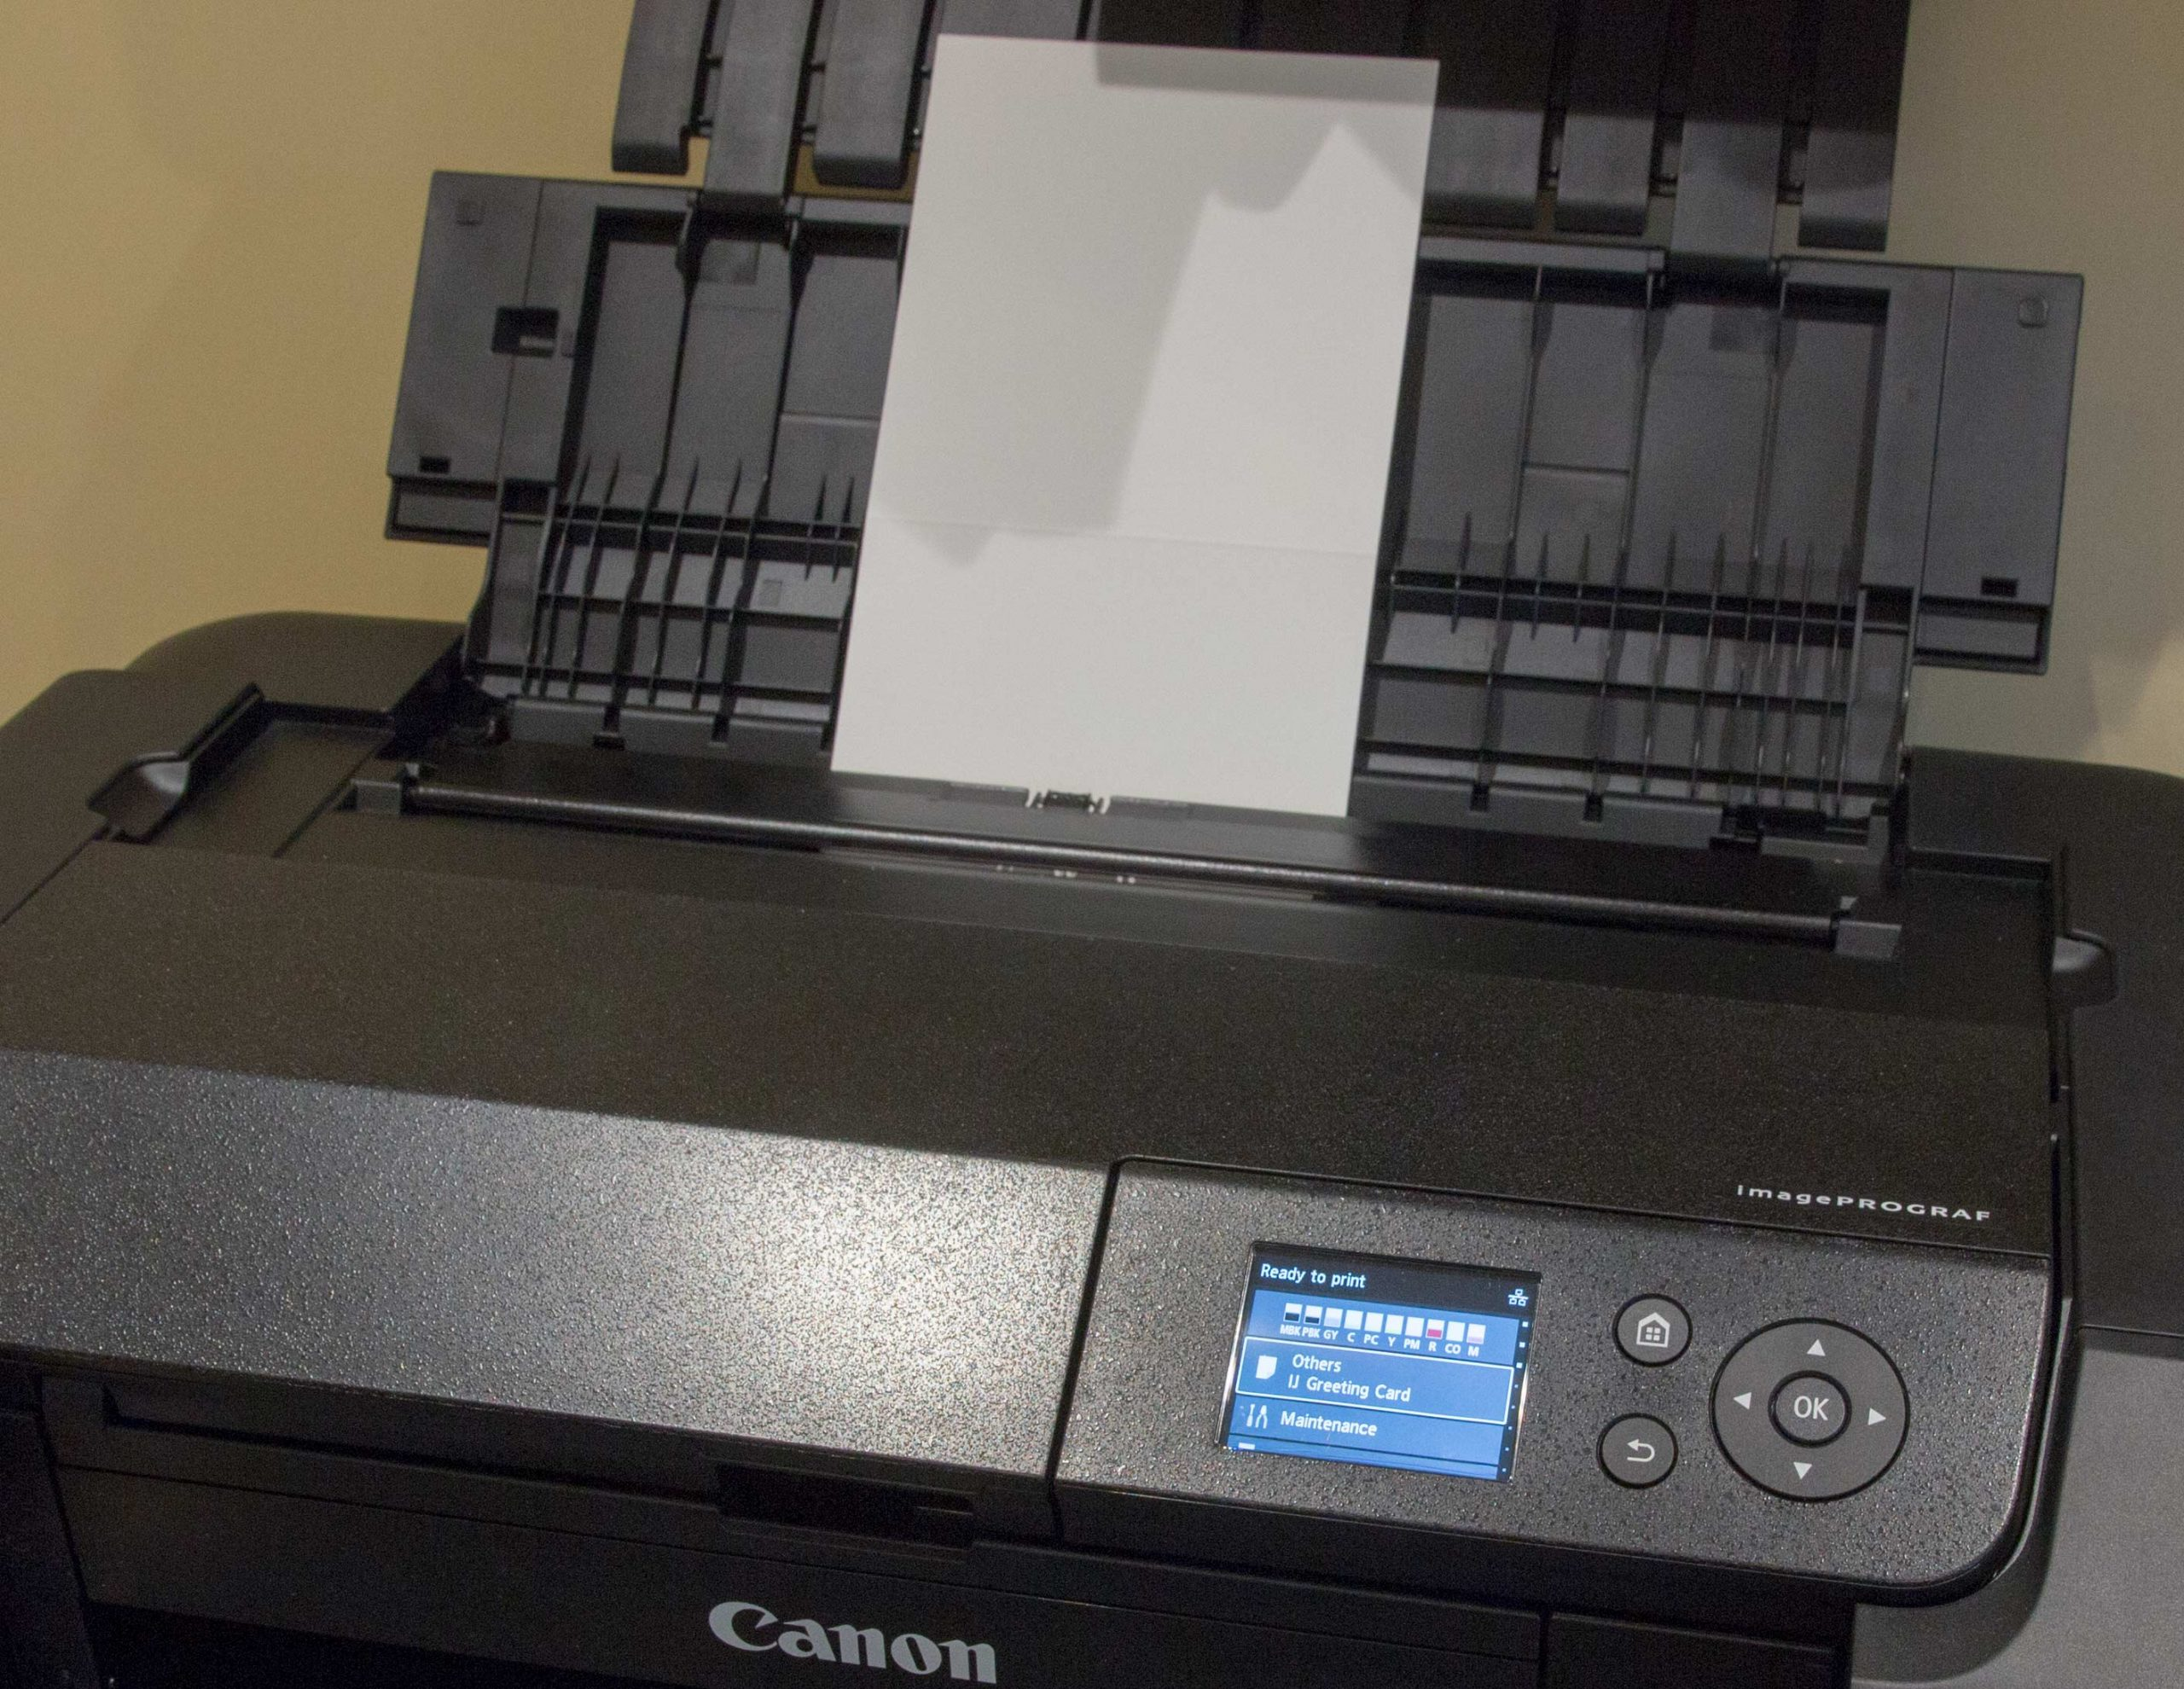 paper-settings-on-printer